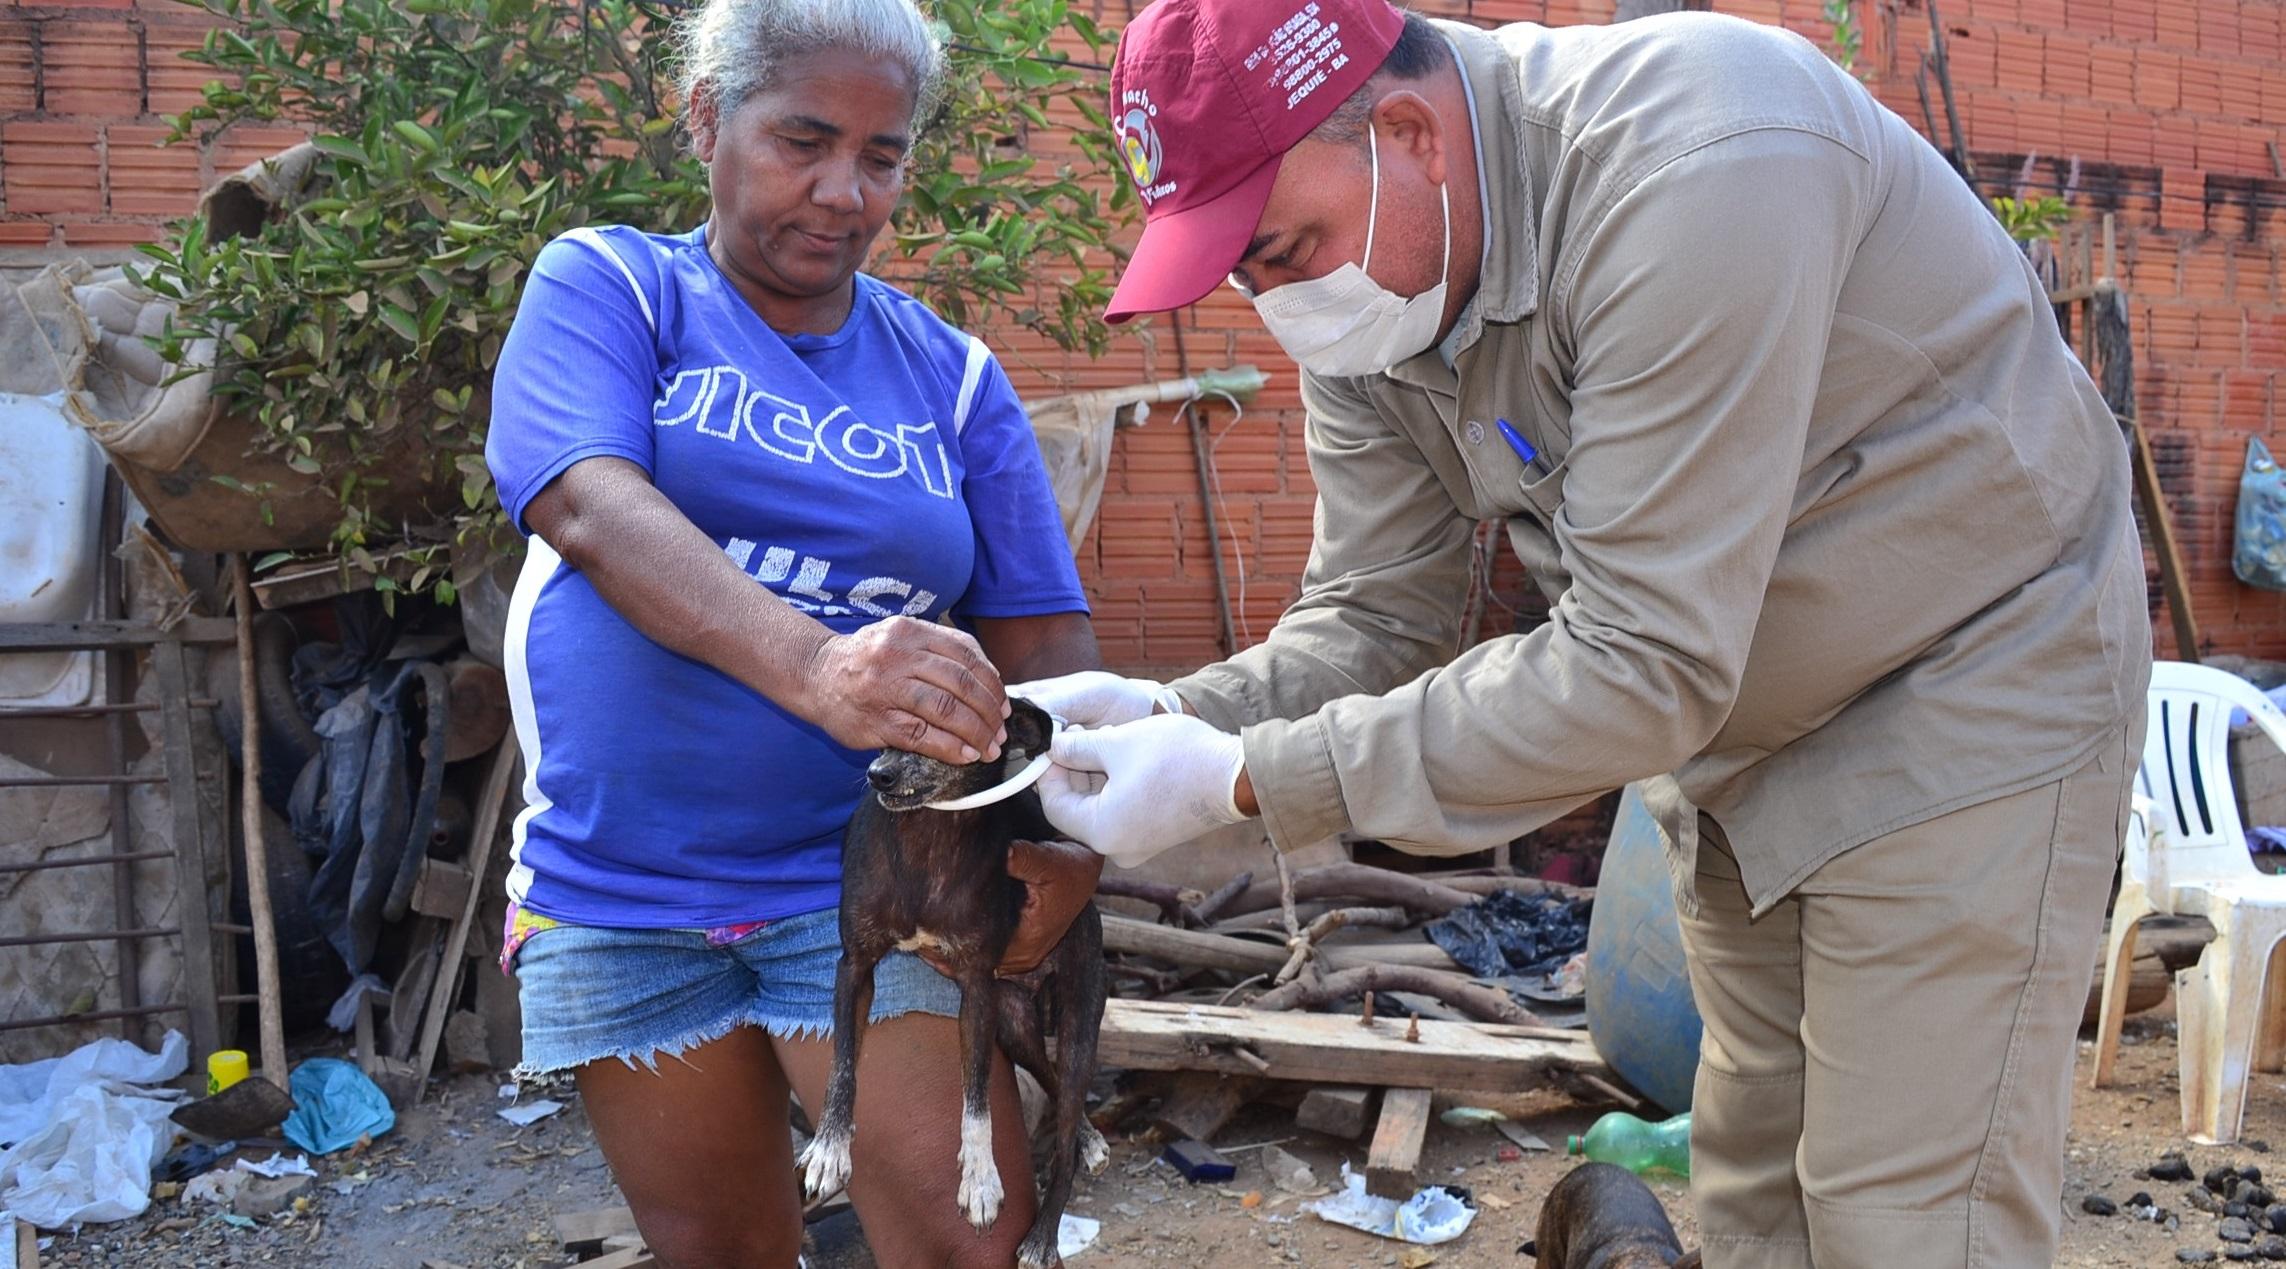 Imagem de destaque Prefeitura distribui coleiras contra a leishmaniose